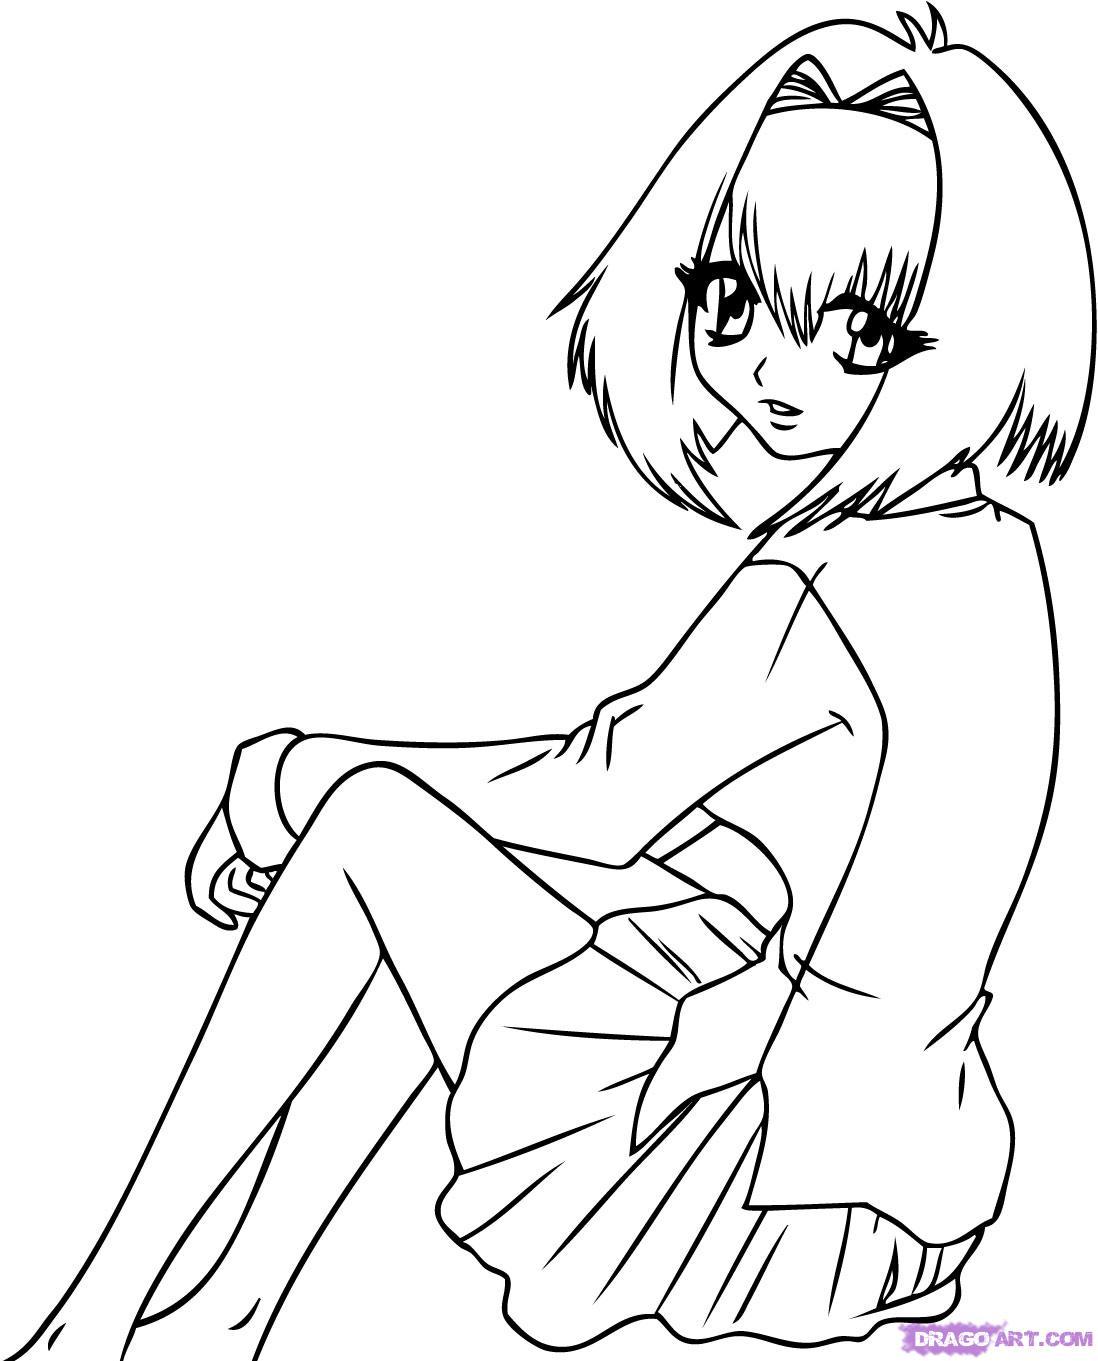 Drawn vampire outline Girl Coloring Coloring karin Vampire